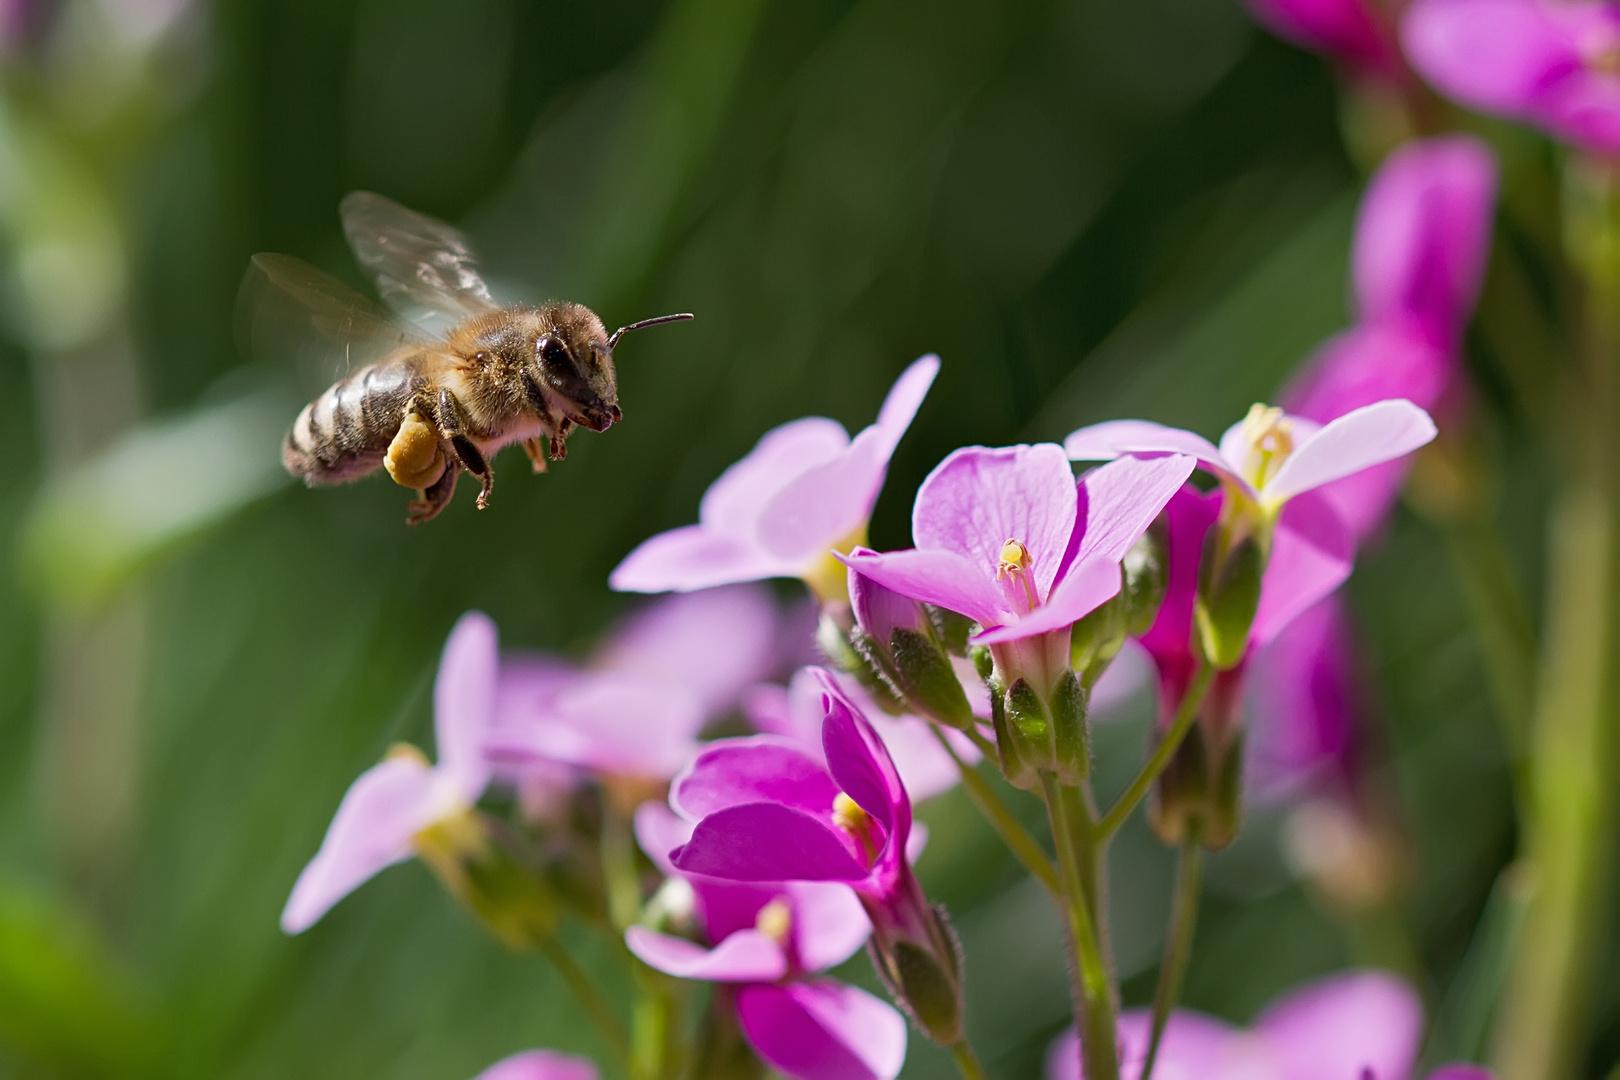 Biene steuert blaues Kissen an.